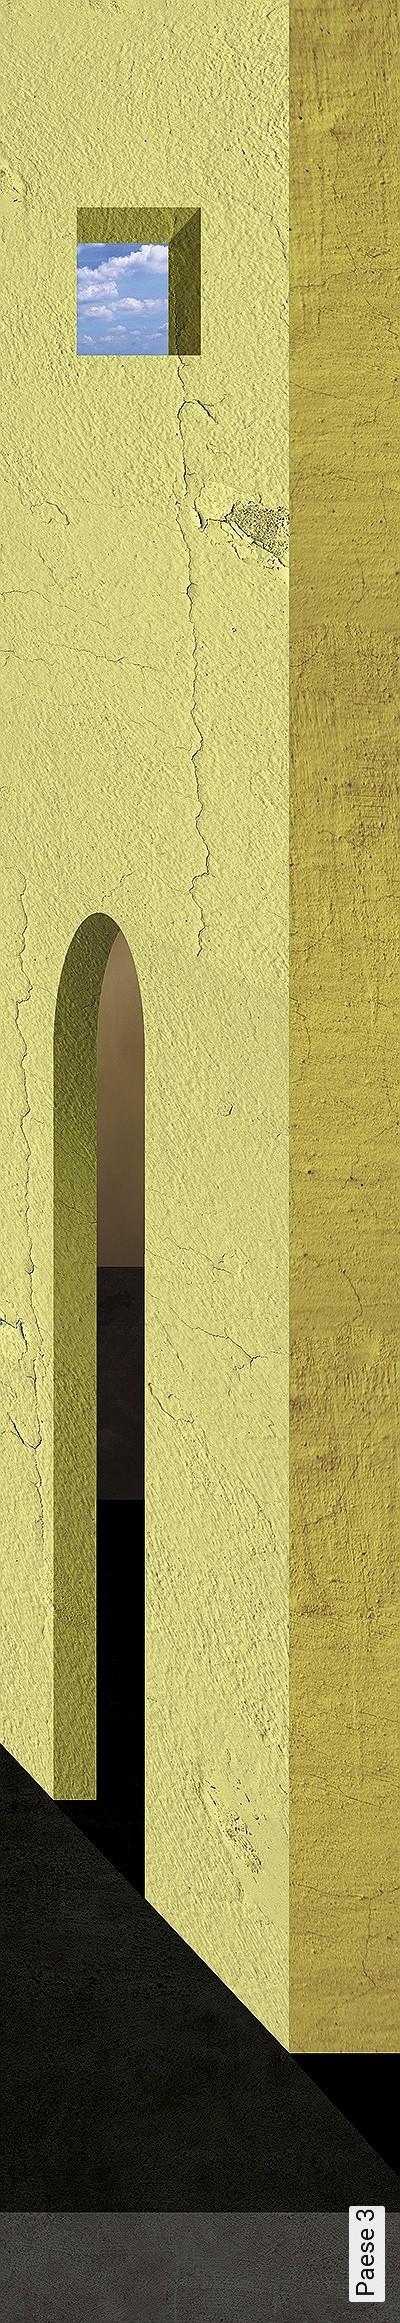 Paese-3-Landschaft-Wolken-Moderne-Muster-Anthrazit-Hellblau